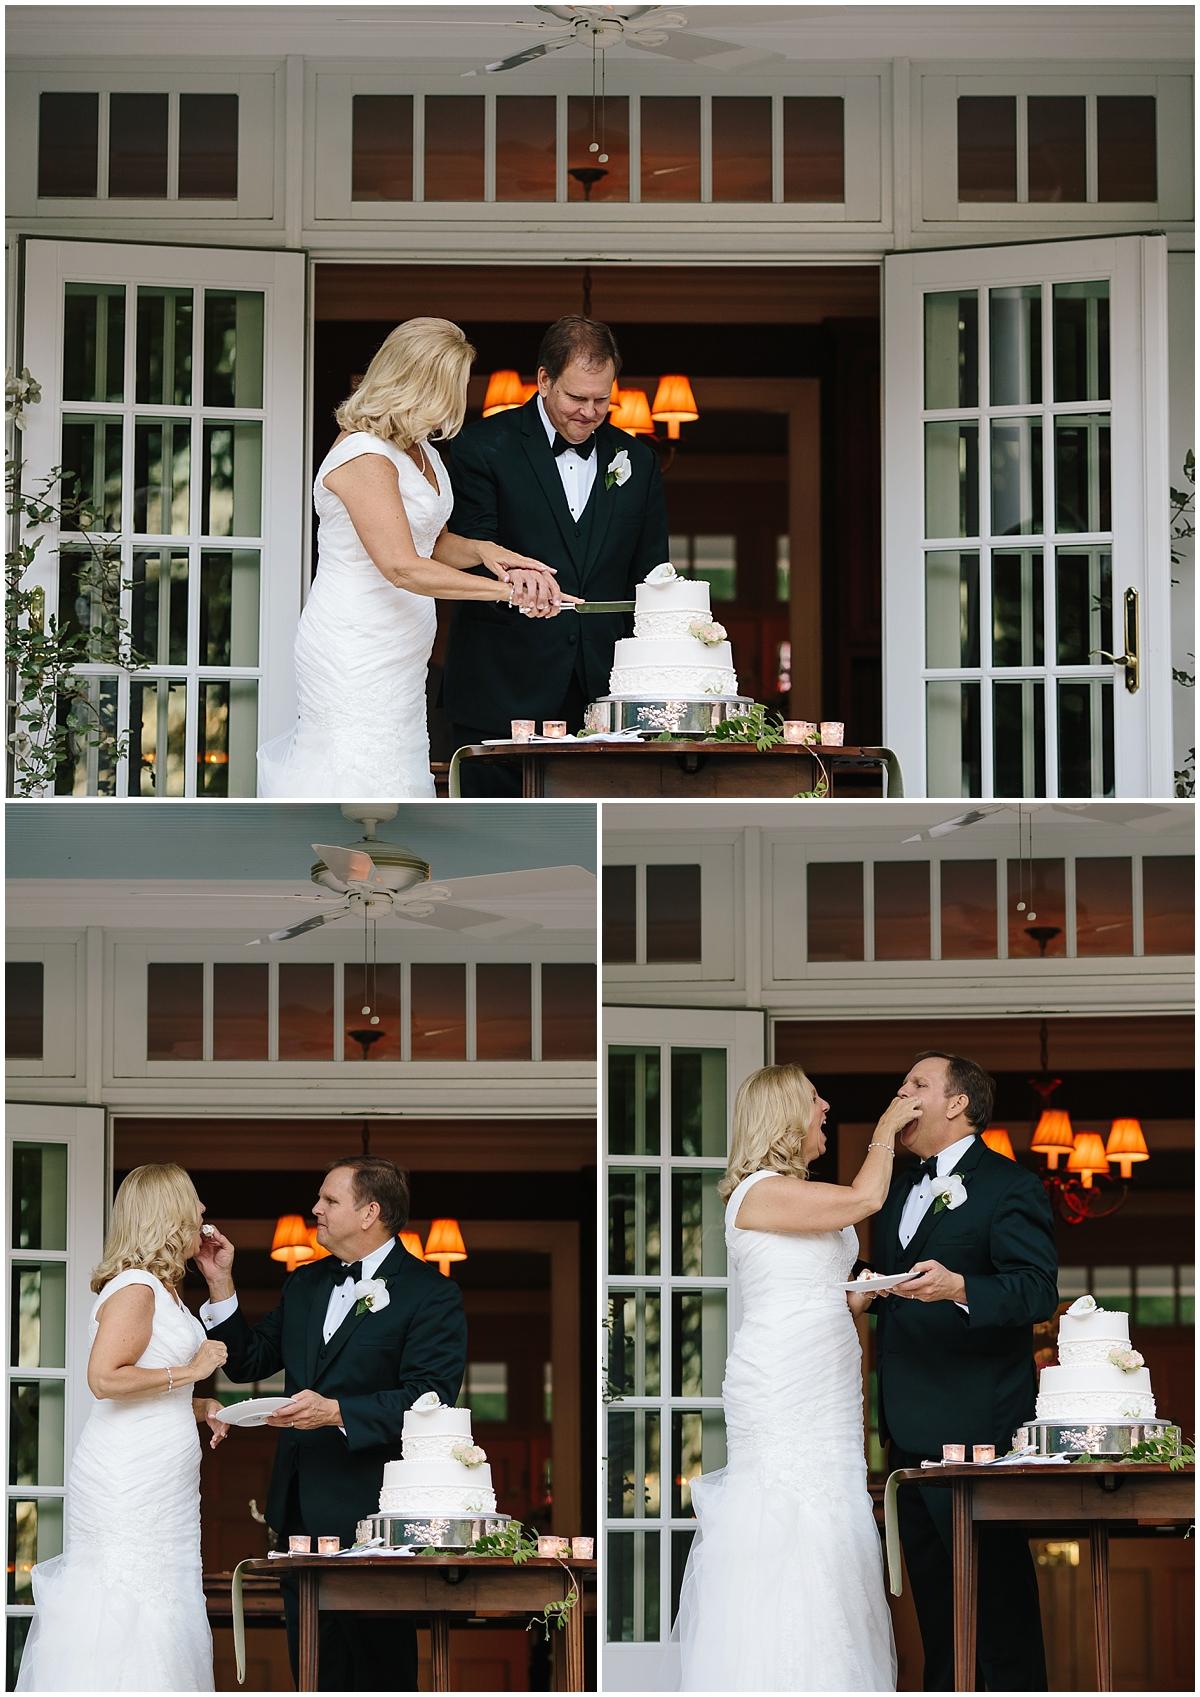 North_Carolina_wedding_photographer__0069.jpg